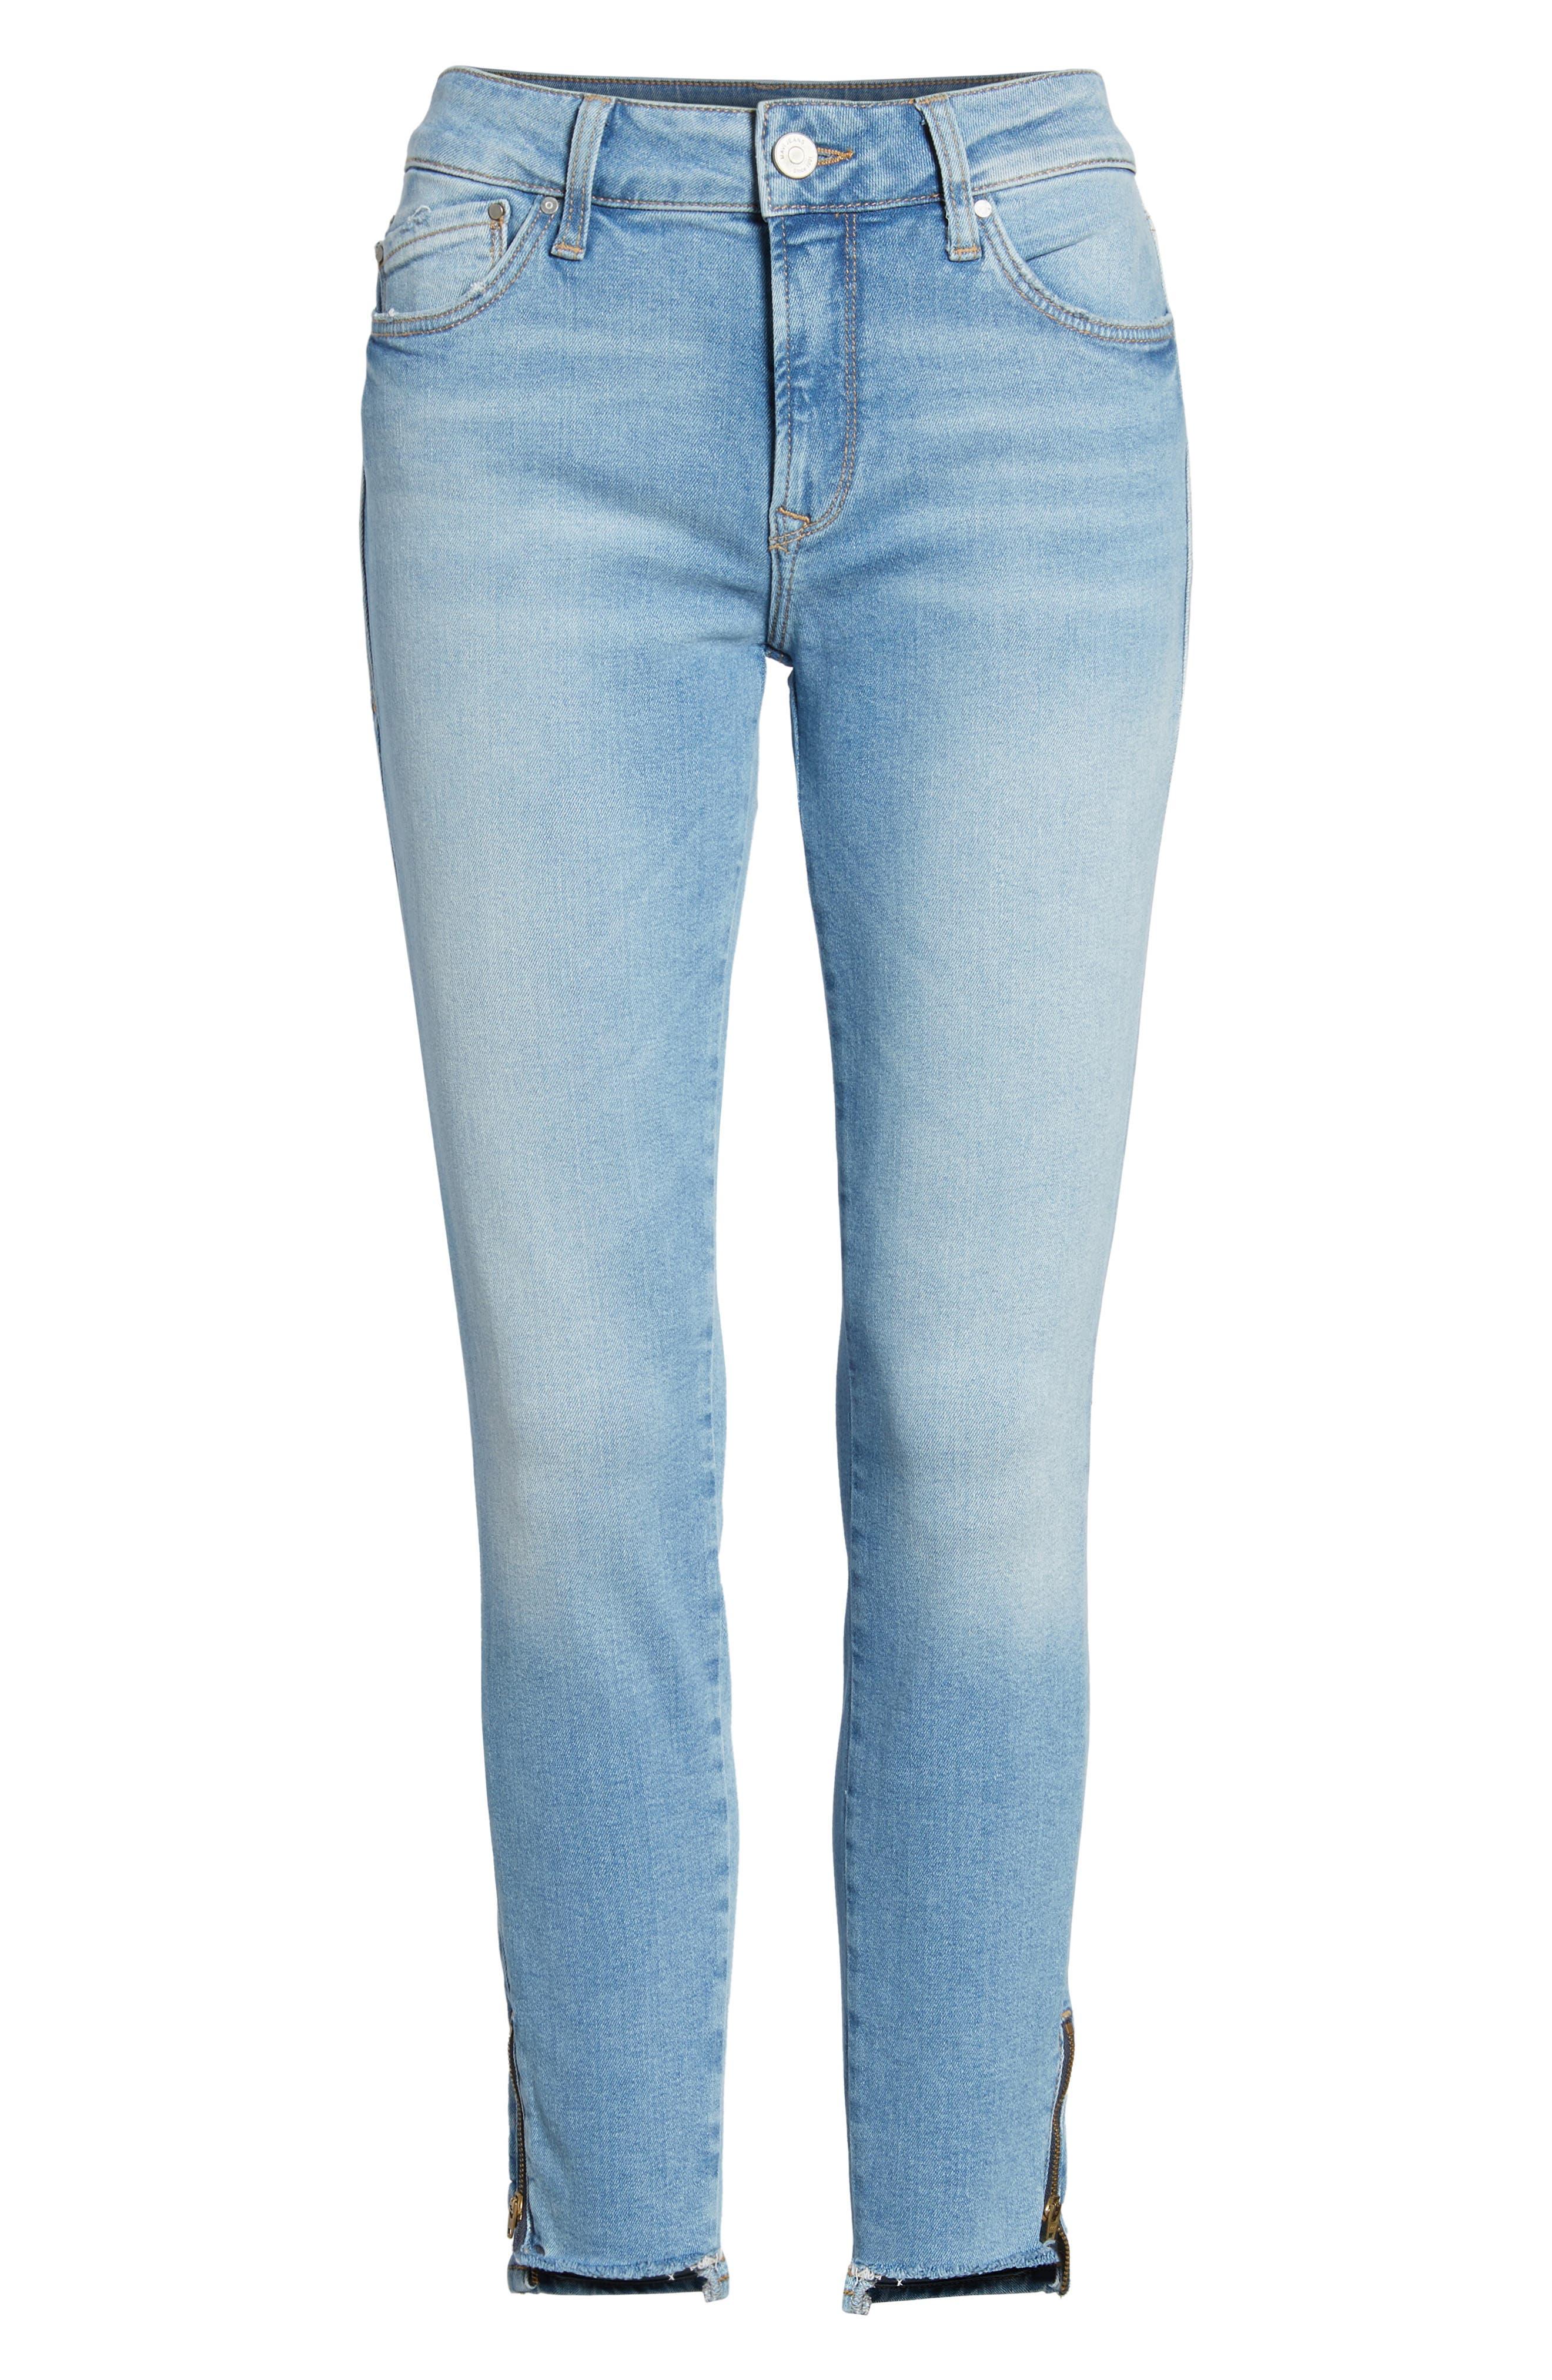 Adriana Ankle Zip Step Hem Jeans,                             Alternate thumbnail 7, color,                             420